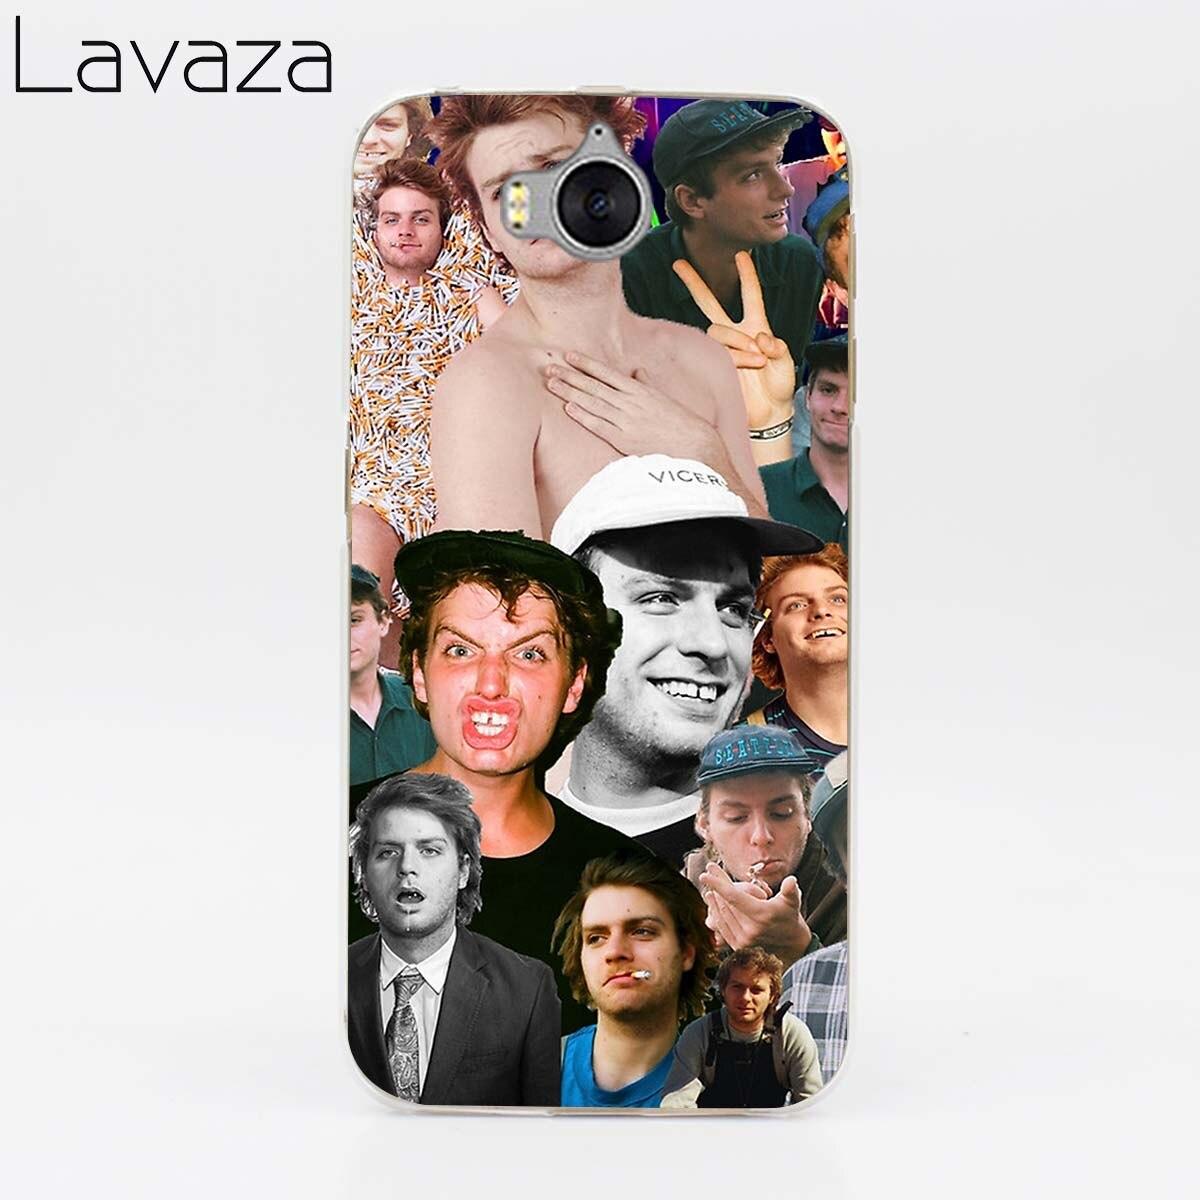 Lavaza Mac DeMarco Case for Huawei Honor Nova 2 2i 2s 9 8 lite 7 7X 6 6C 6X 6A Y7 Y6 Y5 Y3 2017 II Y6II Y5II Y3II G7